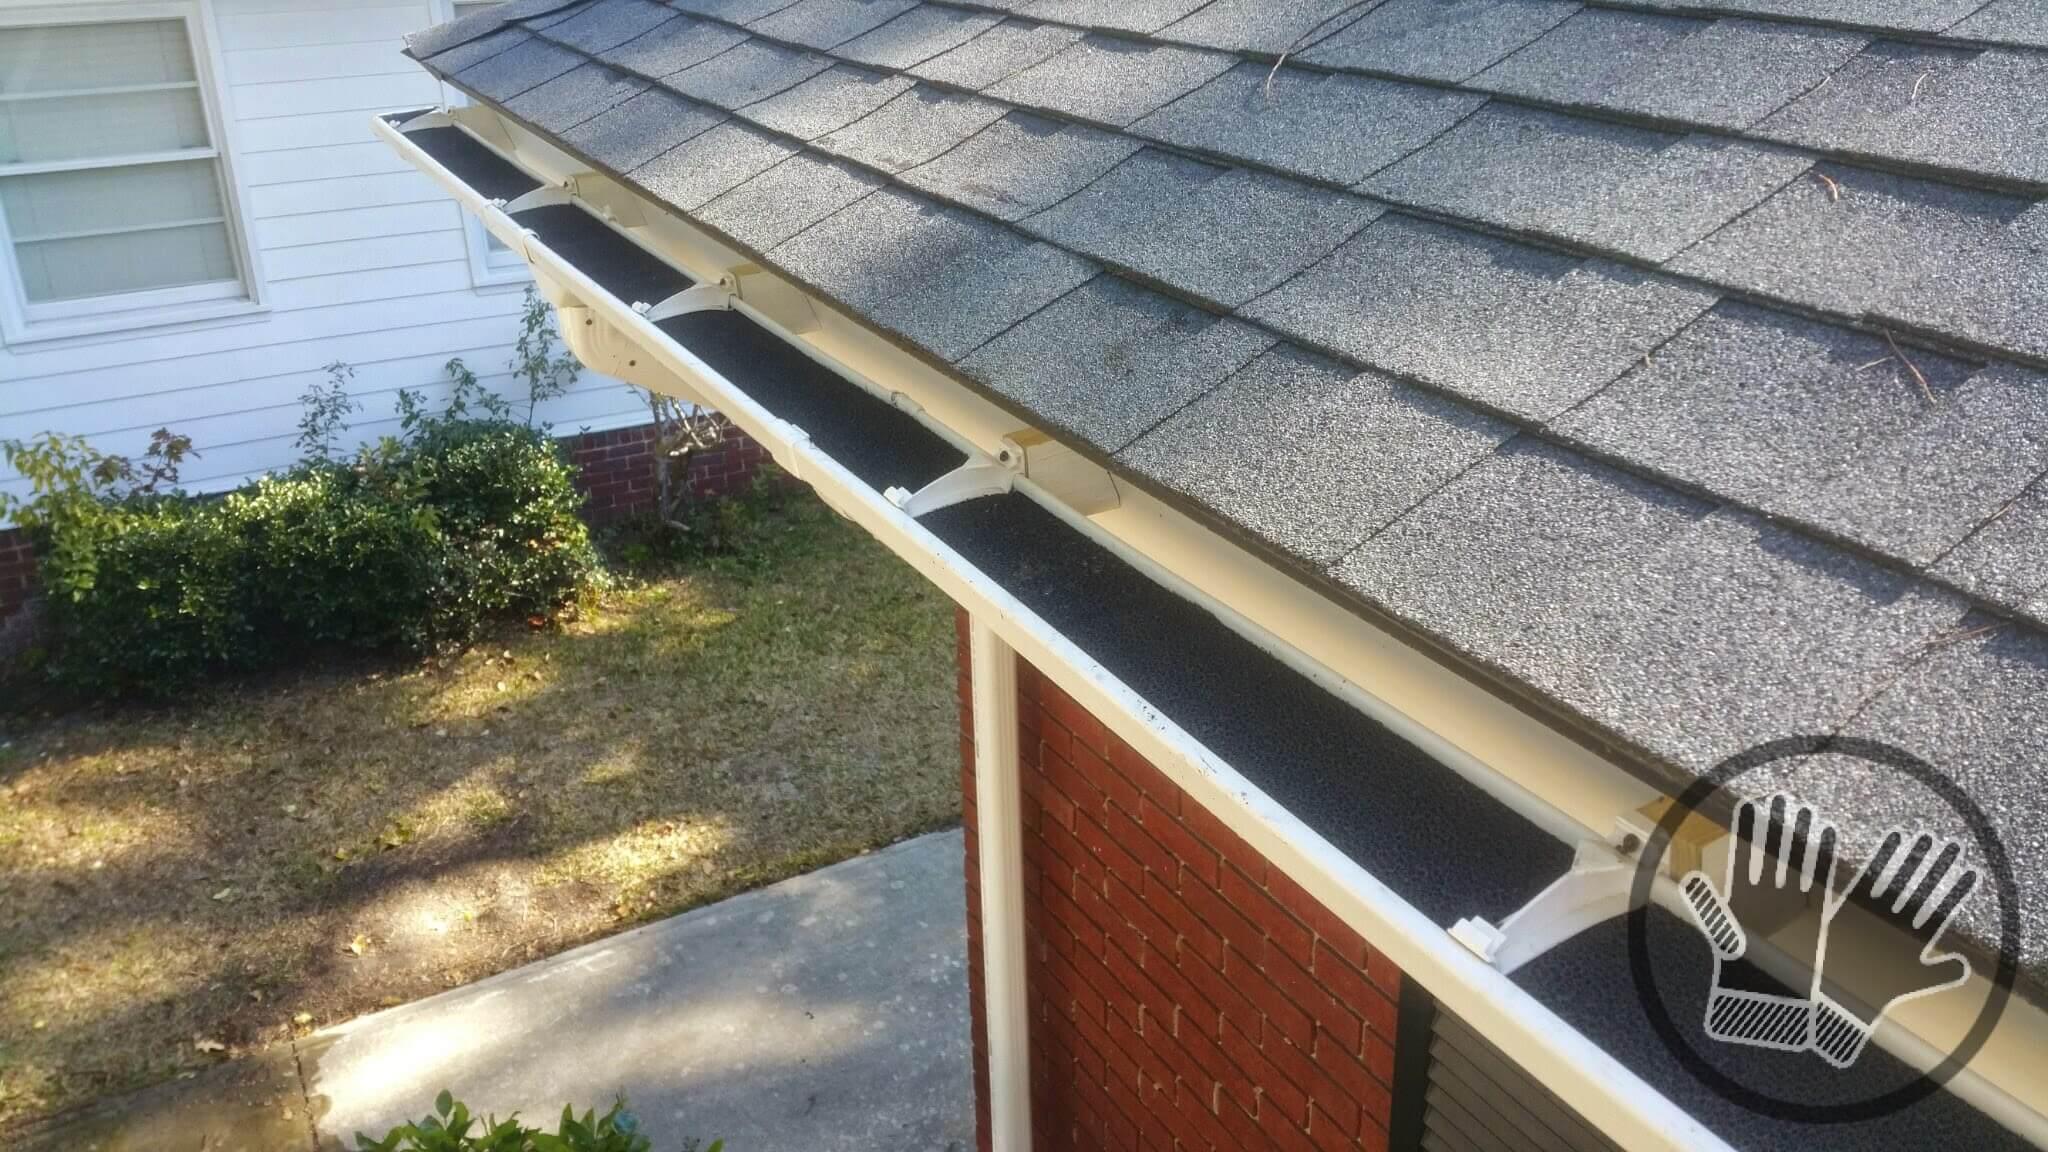 How much for gutter guards installed - Gutter Stuff Gutter Guards Installed